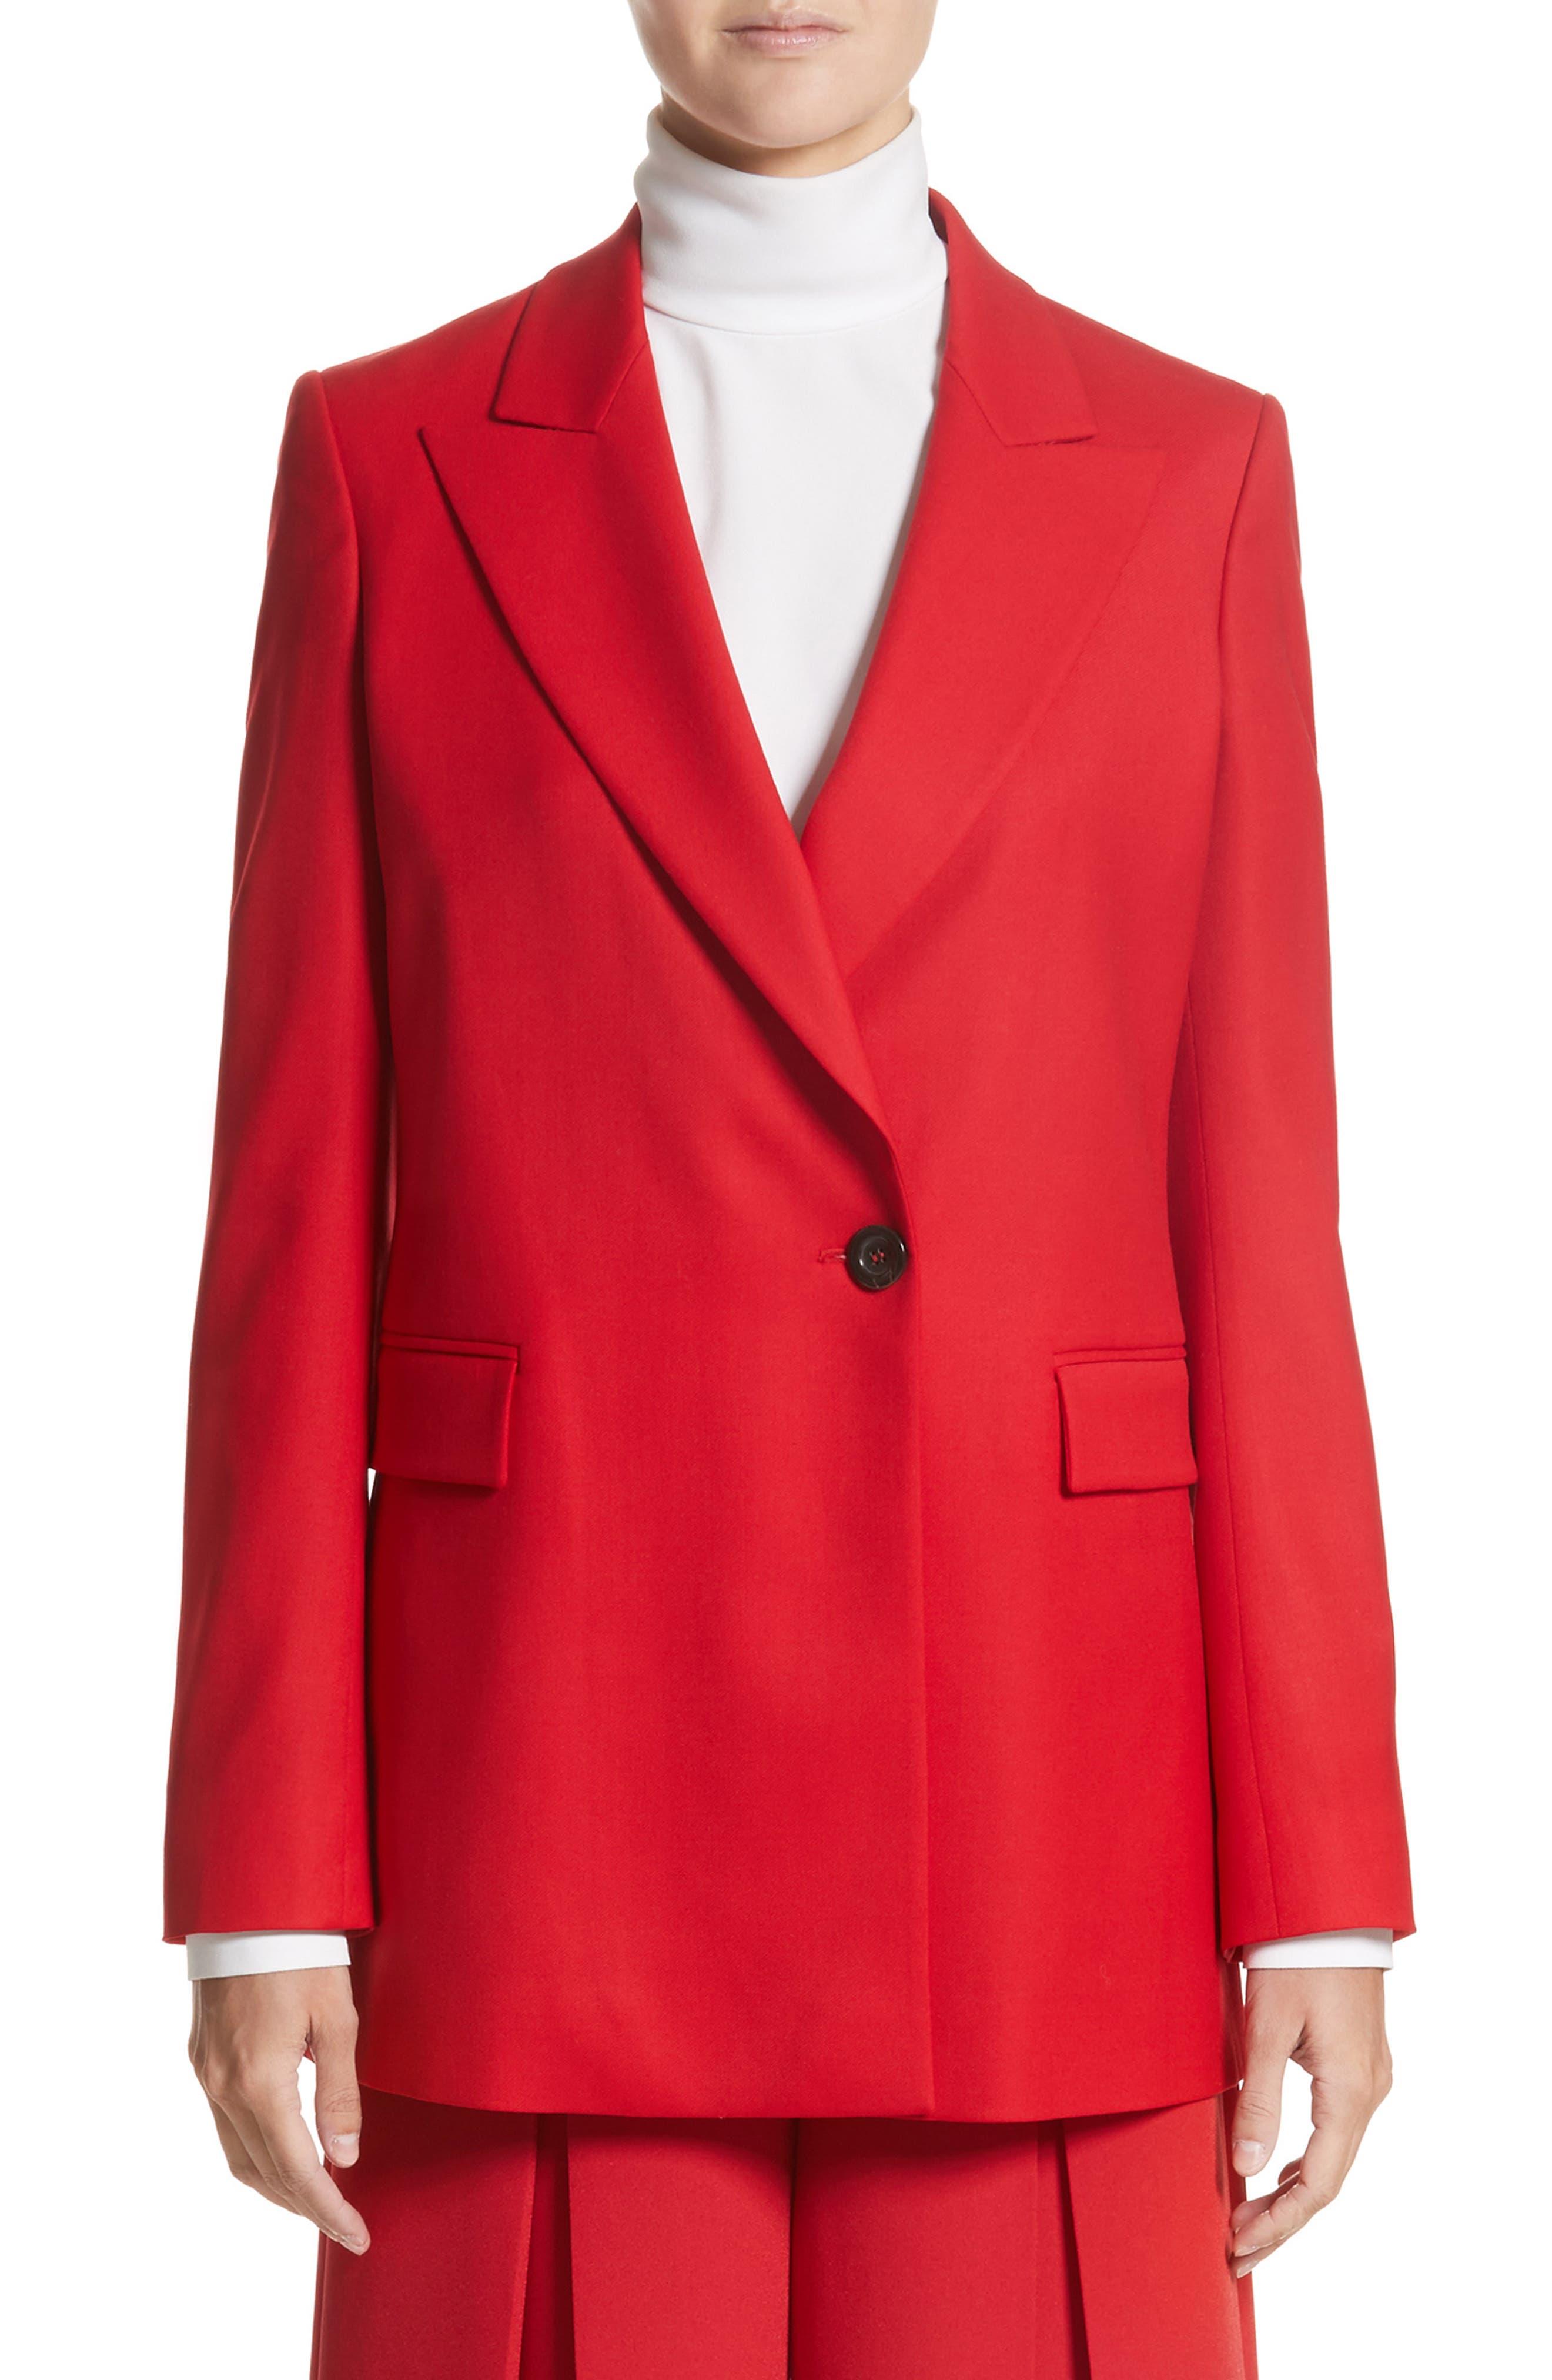 SARA BATTAGLIA Stretch Wool Blazer